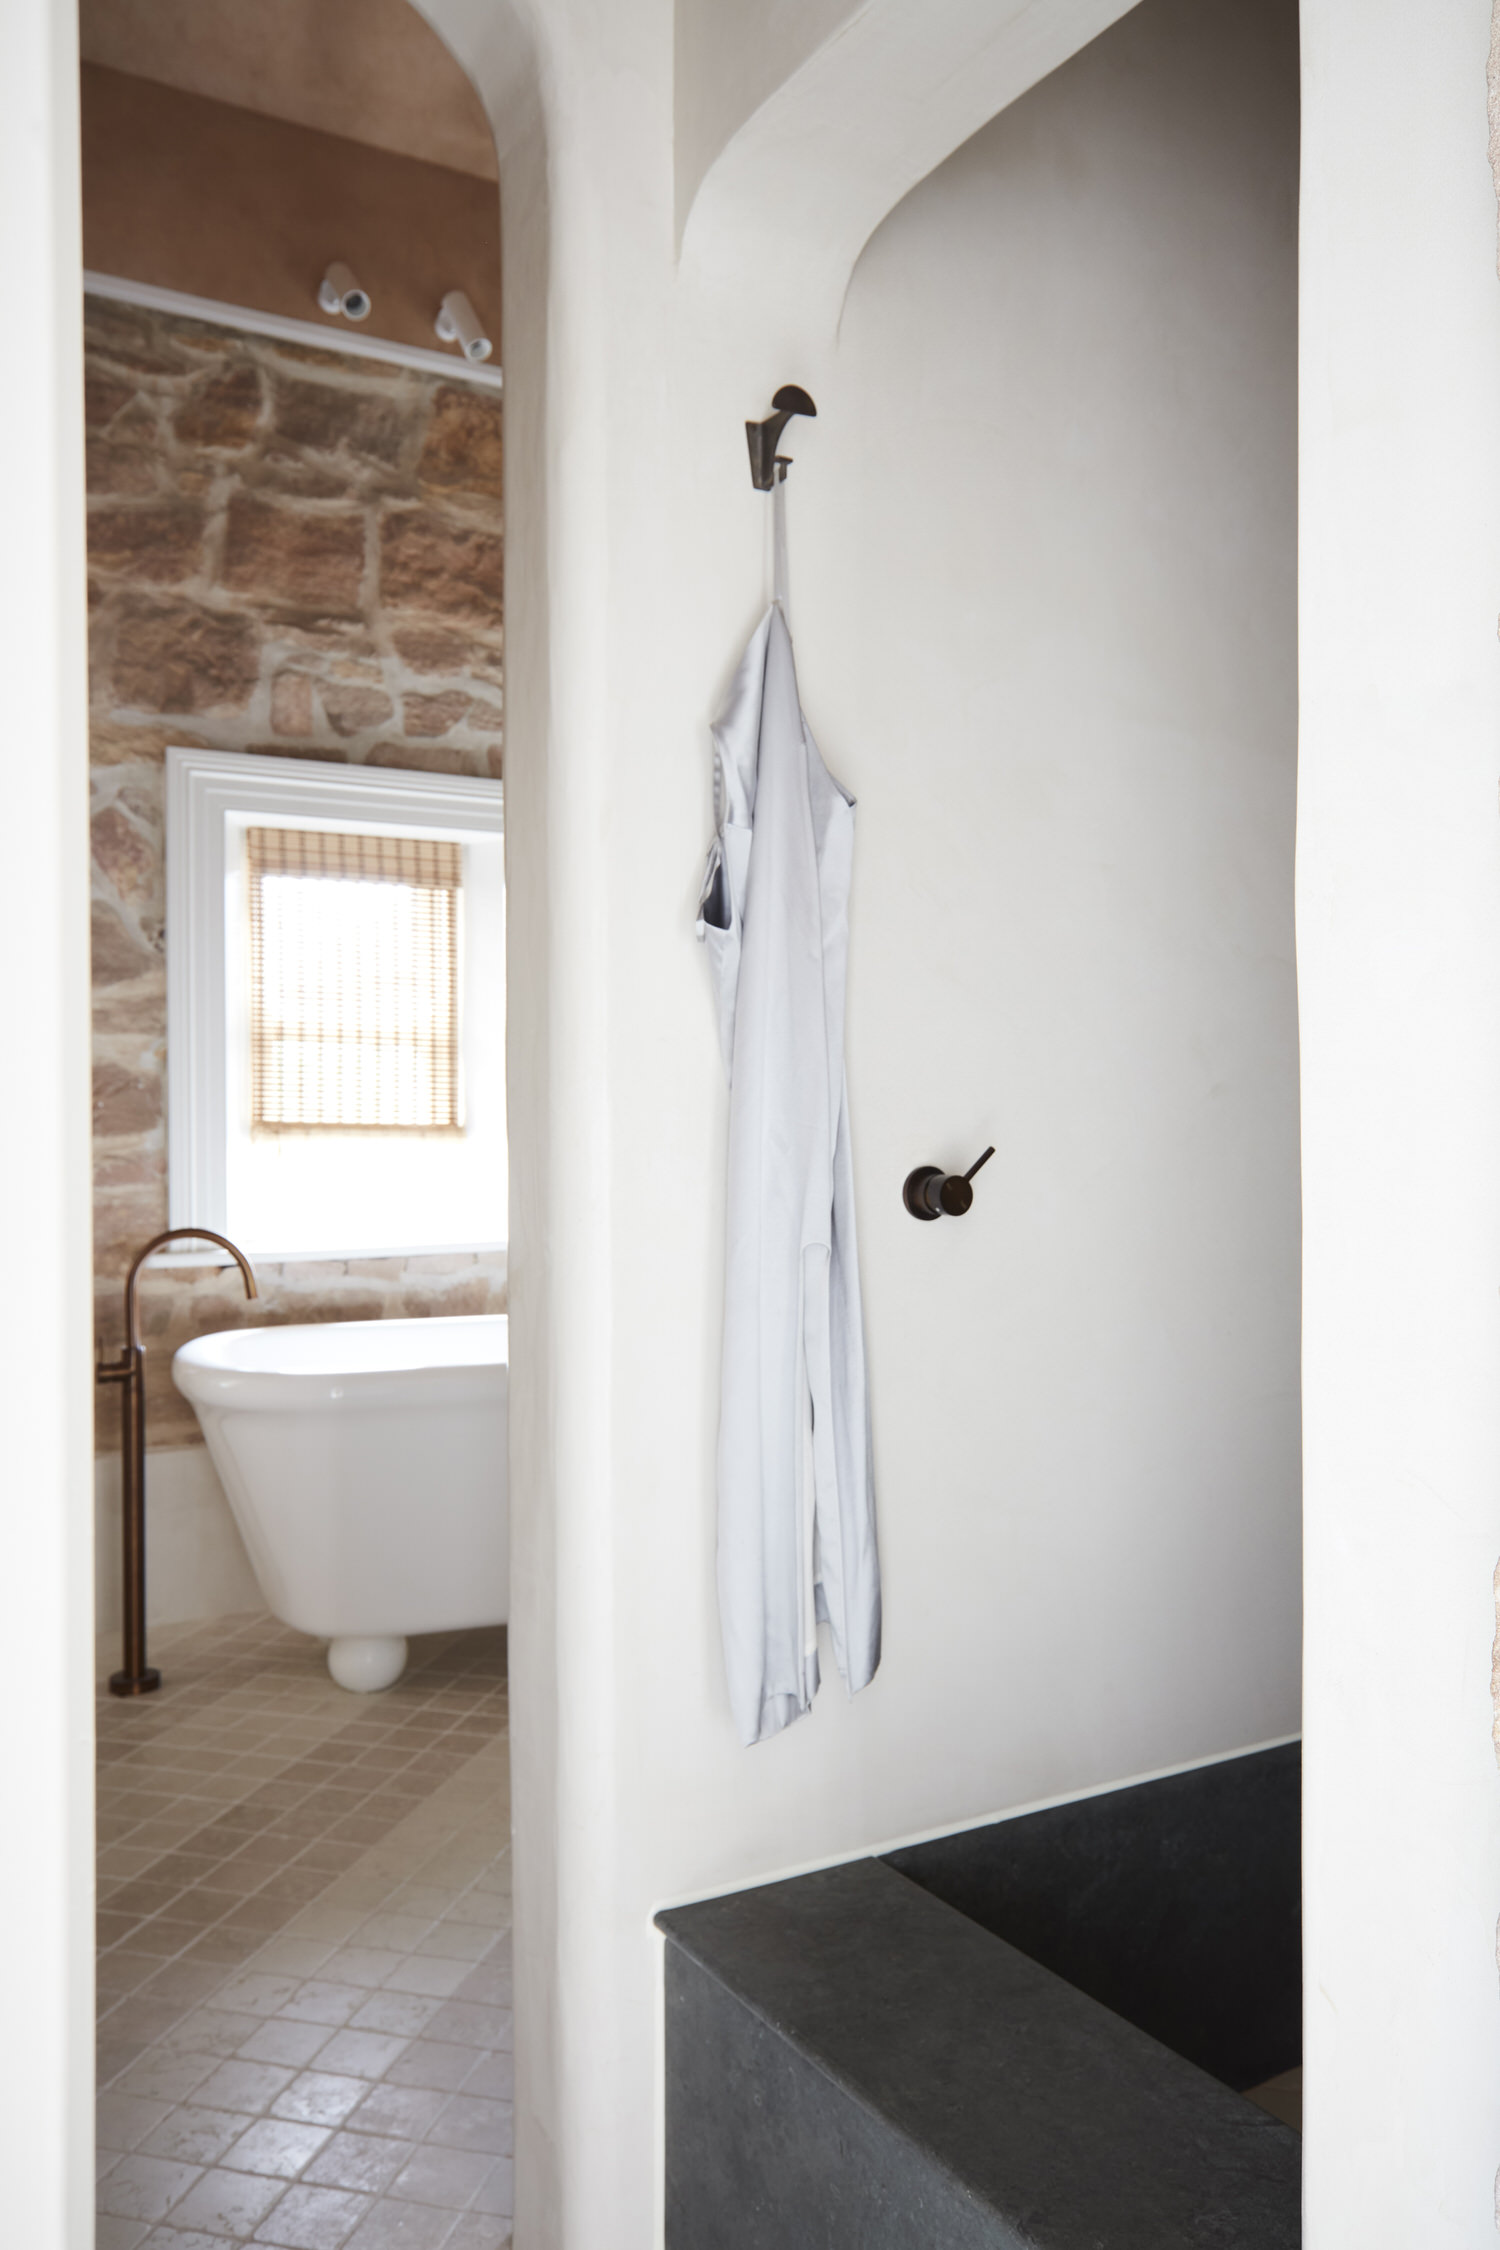 Ysg Studio Soft Serve 75 Evans St Rozelle Sydney Property Photo Prue Ruscoe Yellowtrace 32